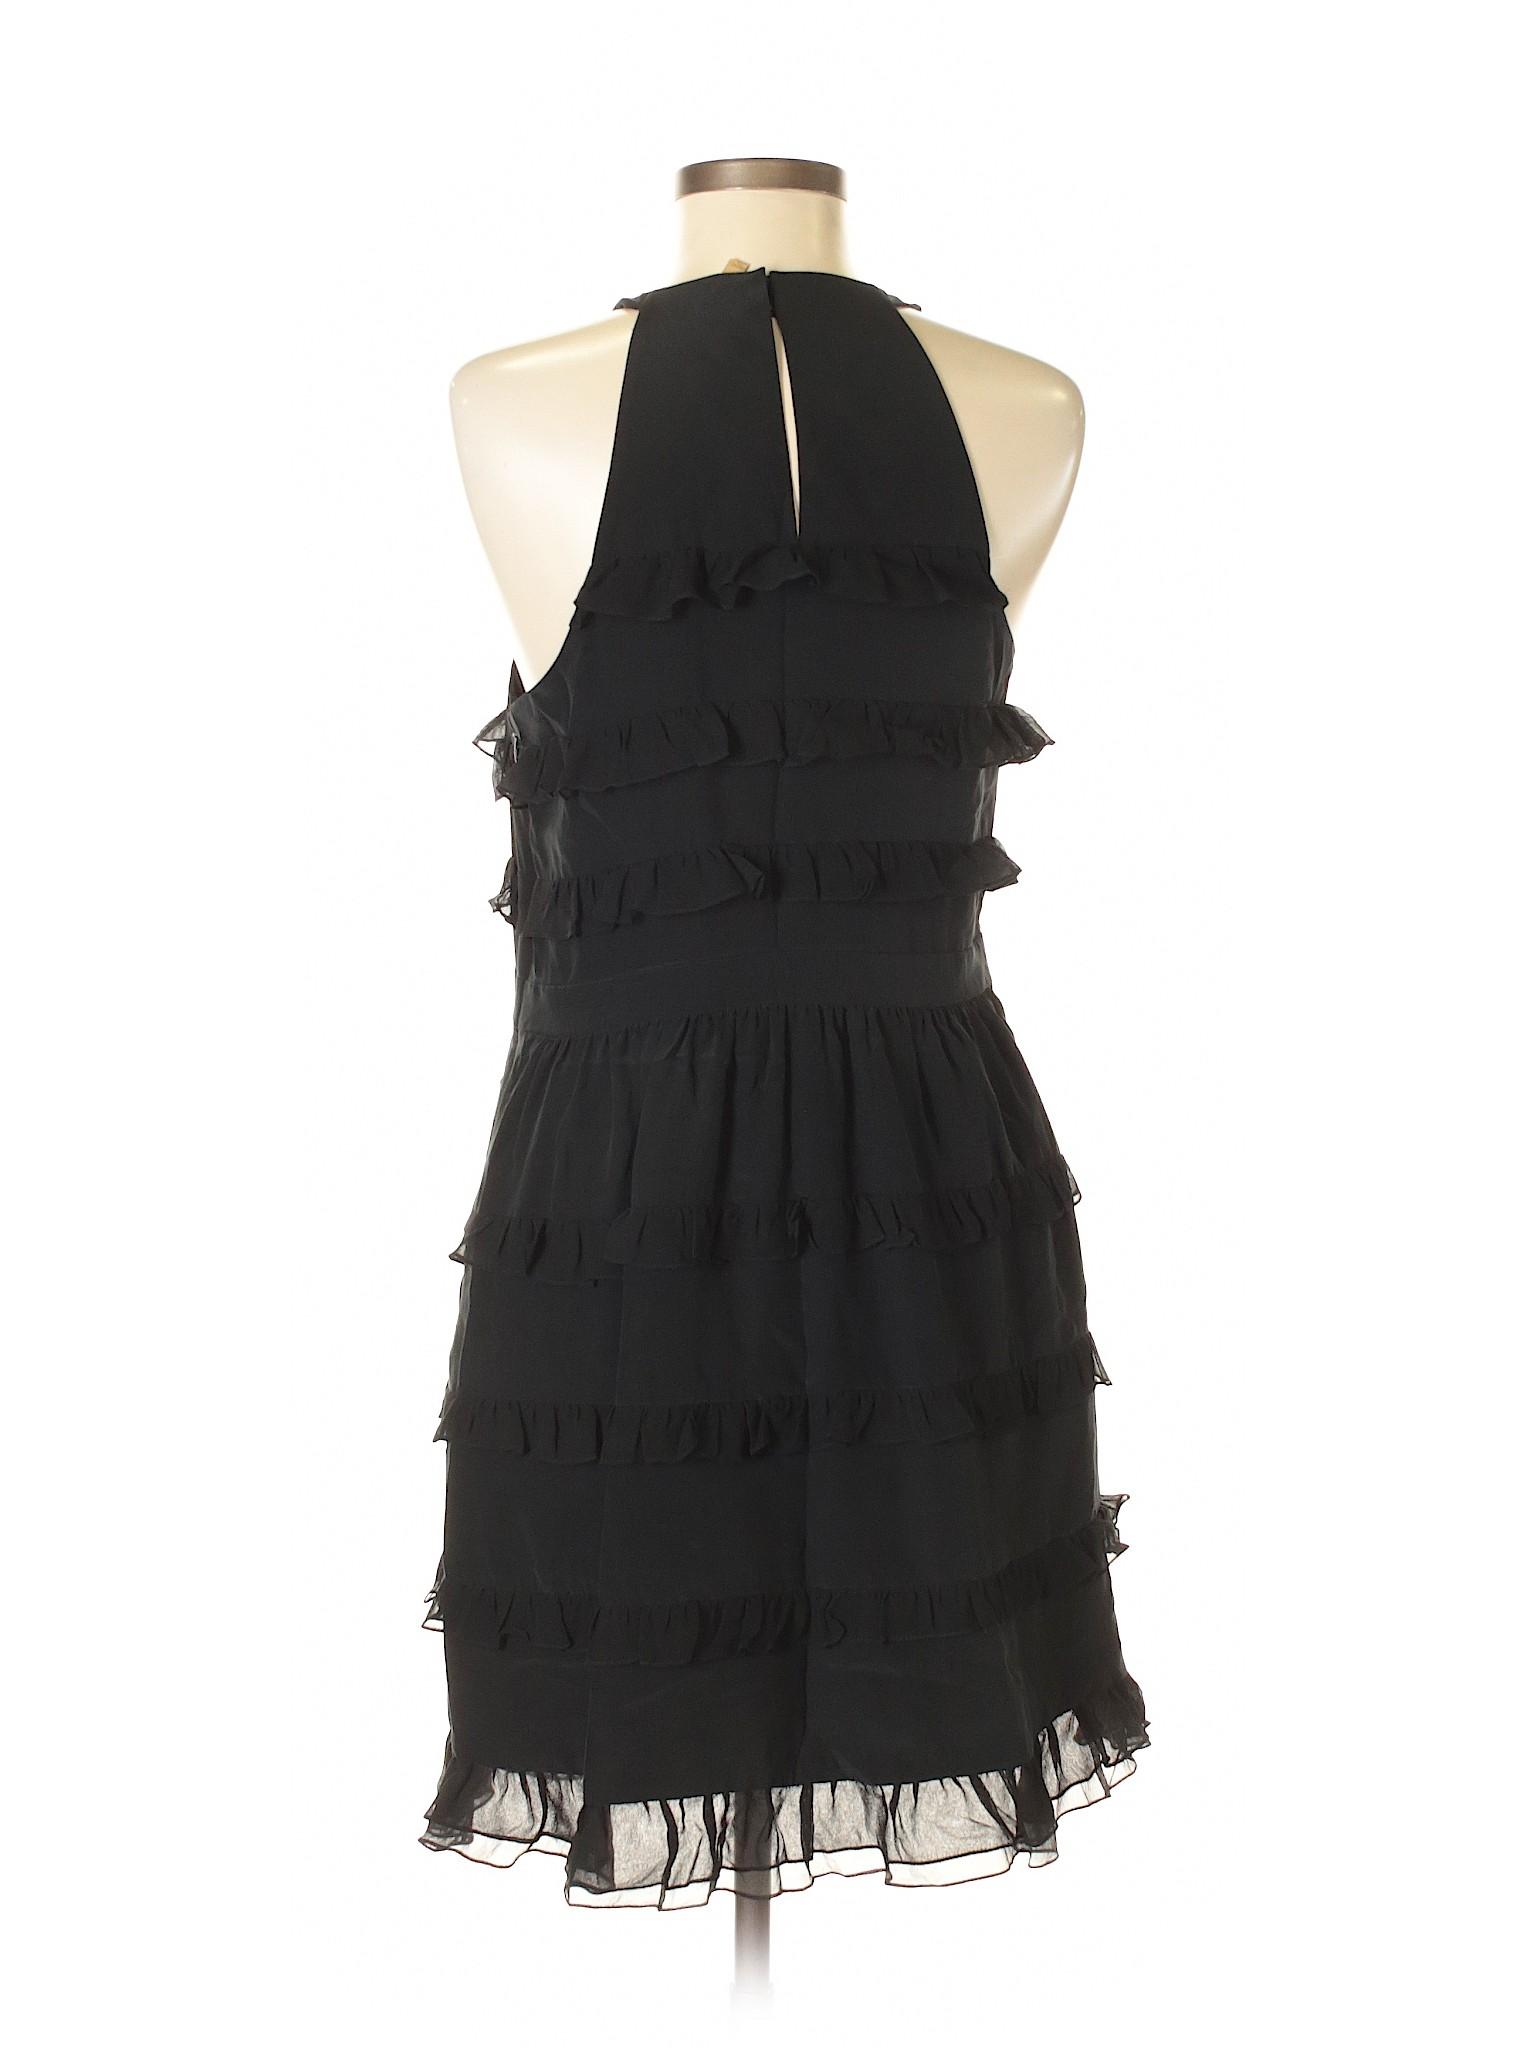 Boutique Tibi Tibi winter Boutique Casual Dress Boutique Tibi Casual winter Dress winter Z5wCqwr6